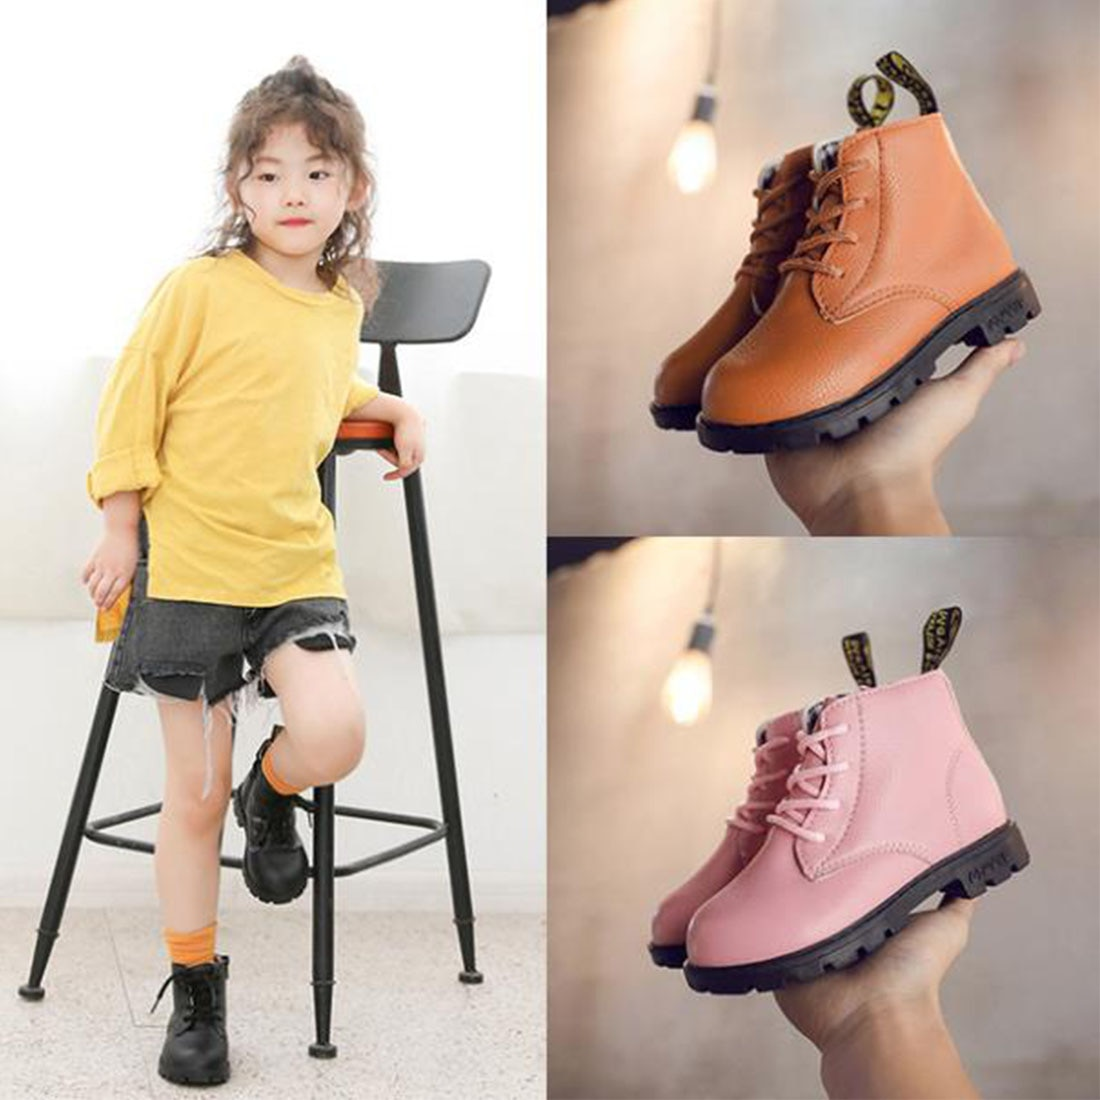 2019 Martin Boots Shoes for Girls Children Warm Fashion Soft Bottom Boys Non-slip Kids Sneakers